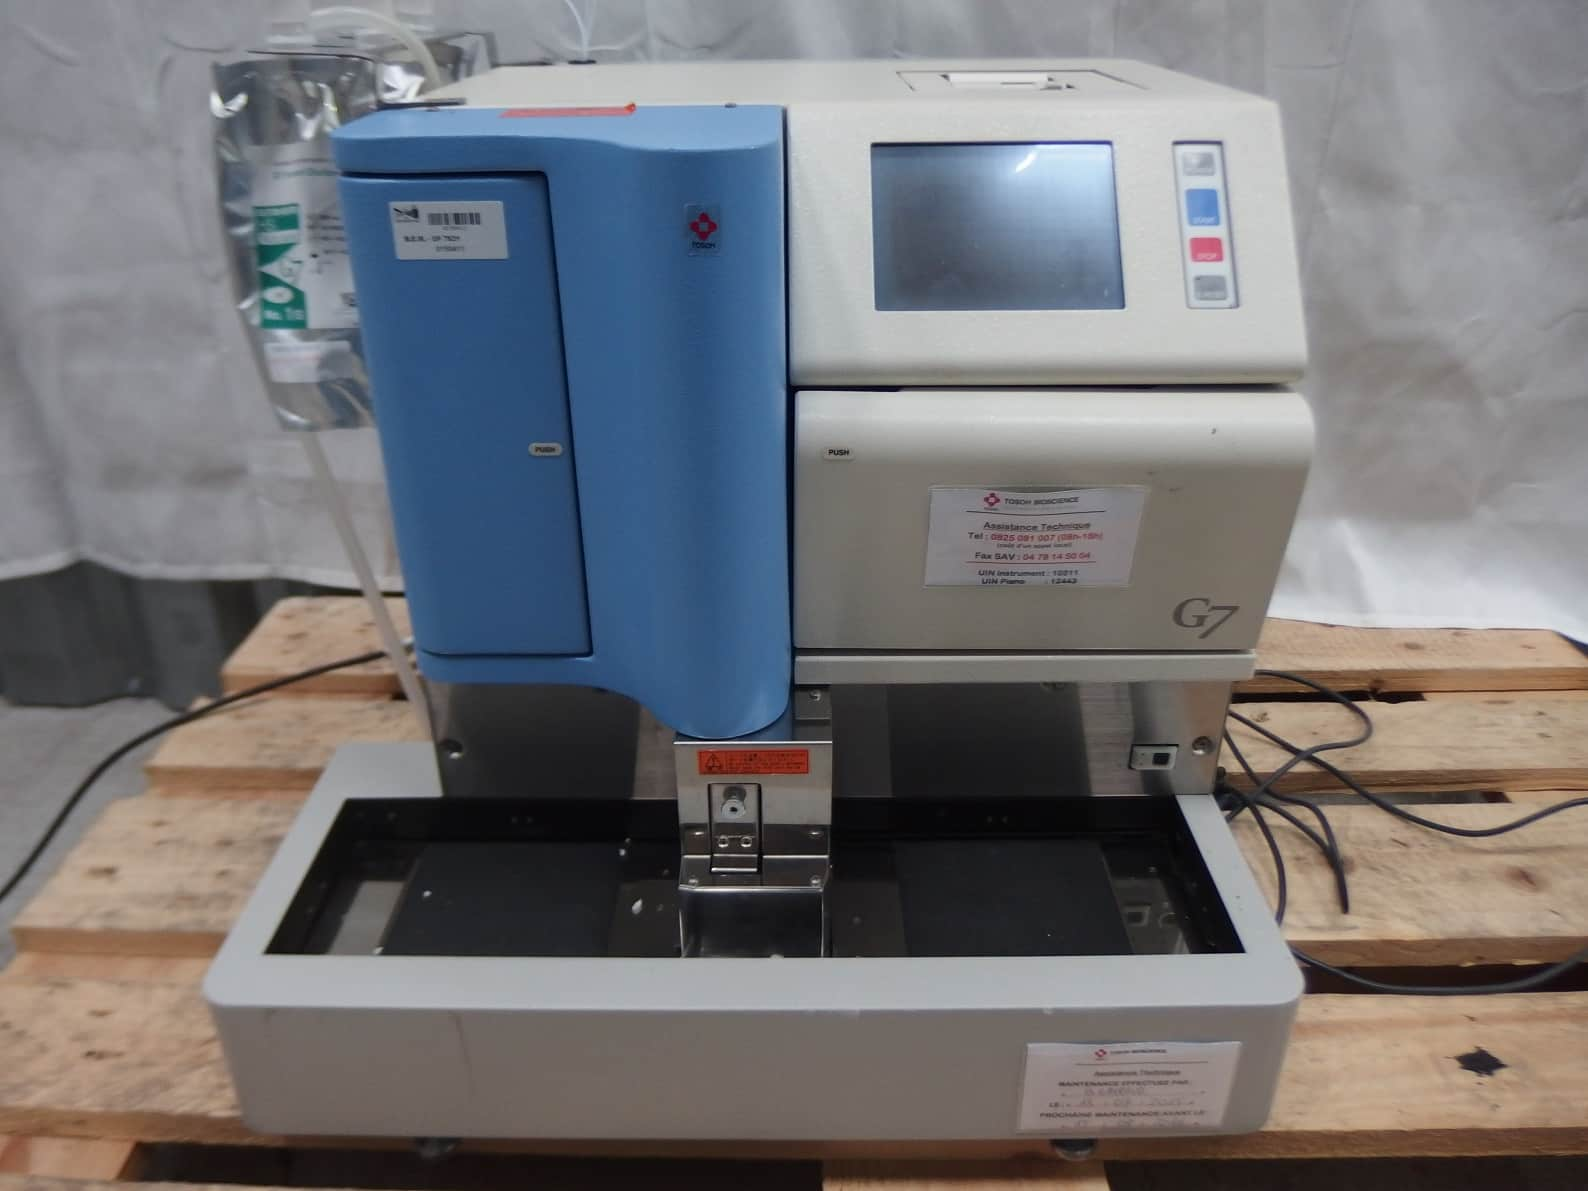 Tosoh Automated Glycohemglobin Analyzer G7 HCL-723G7